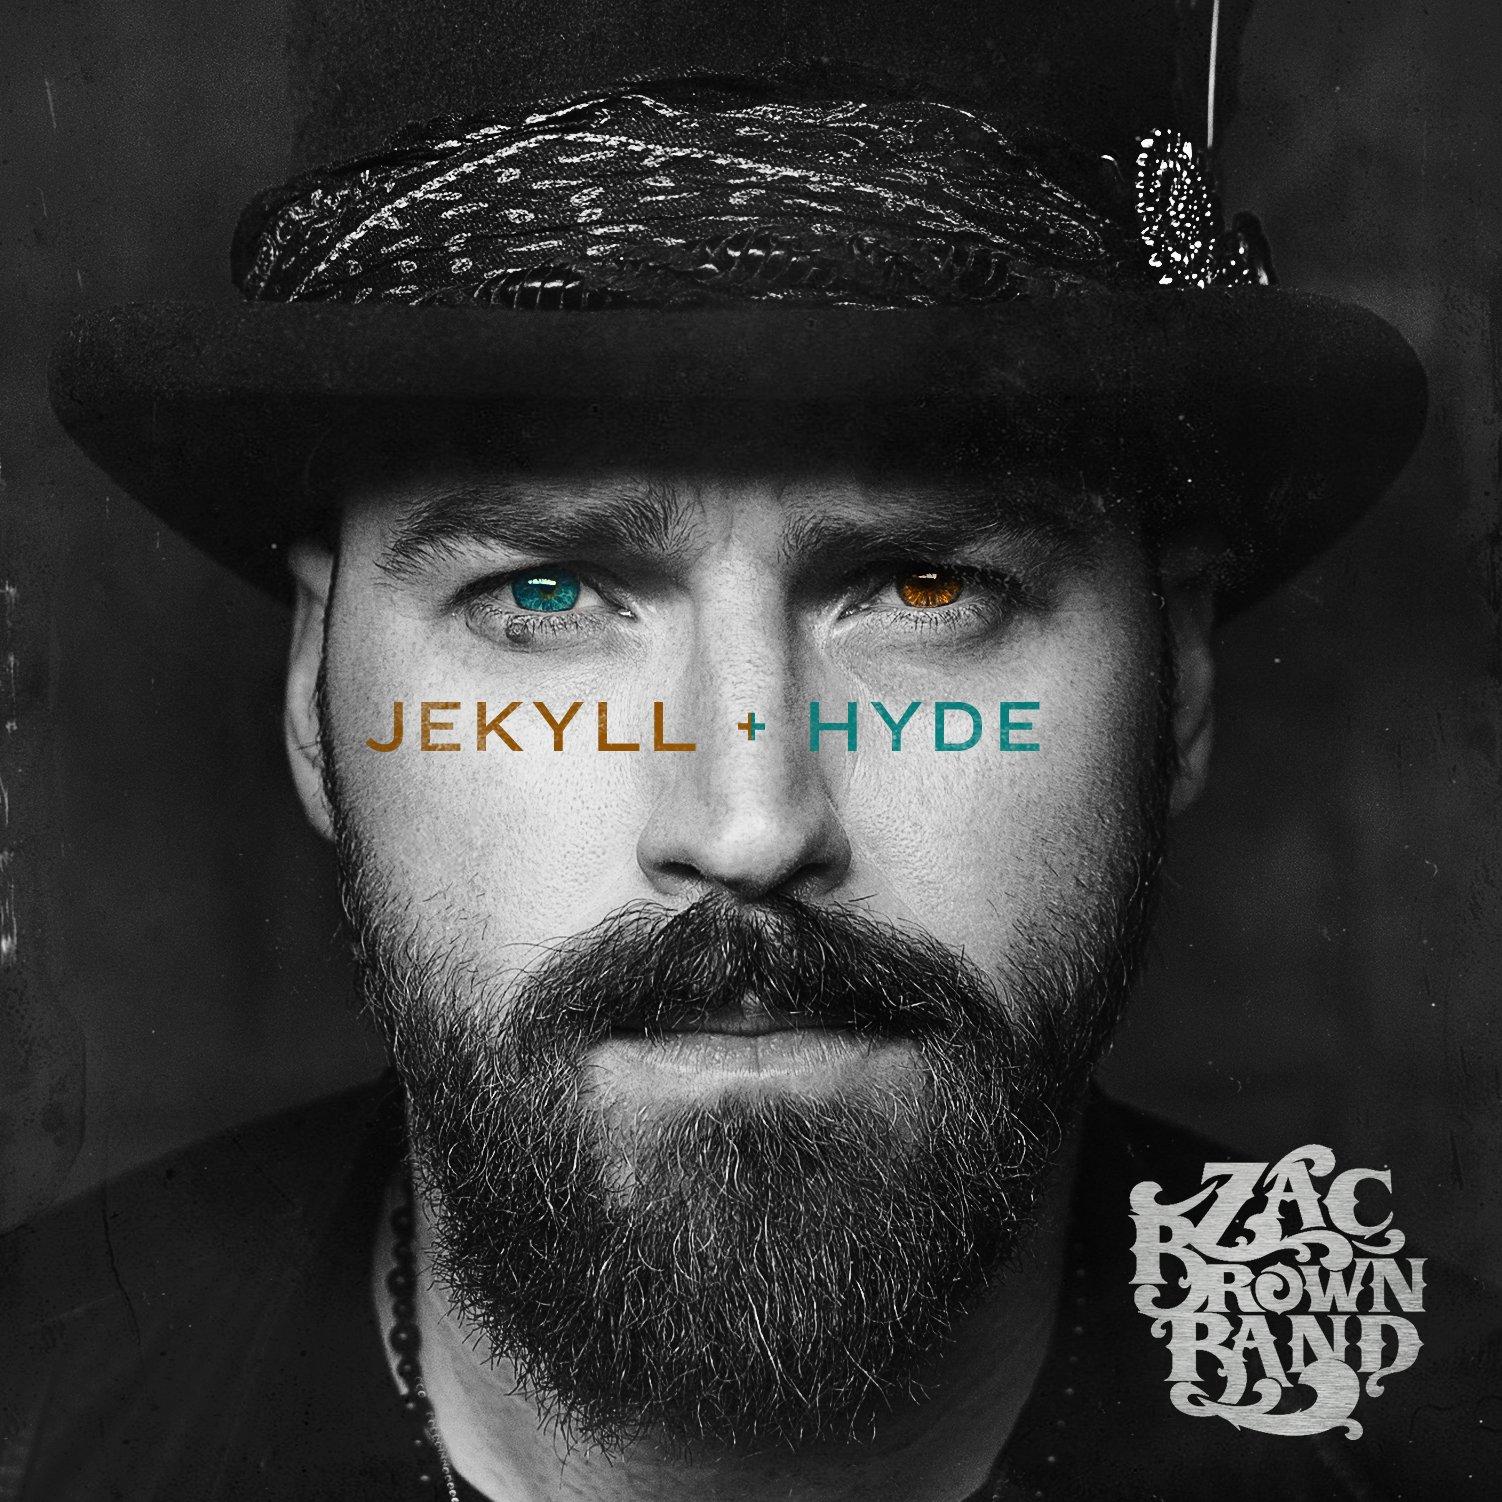 Jekyll + Hyde 4